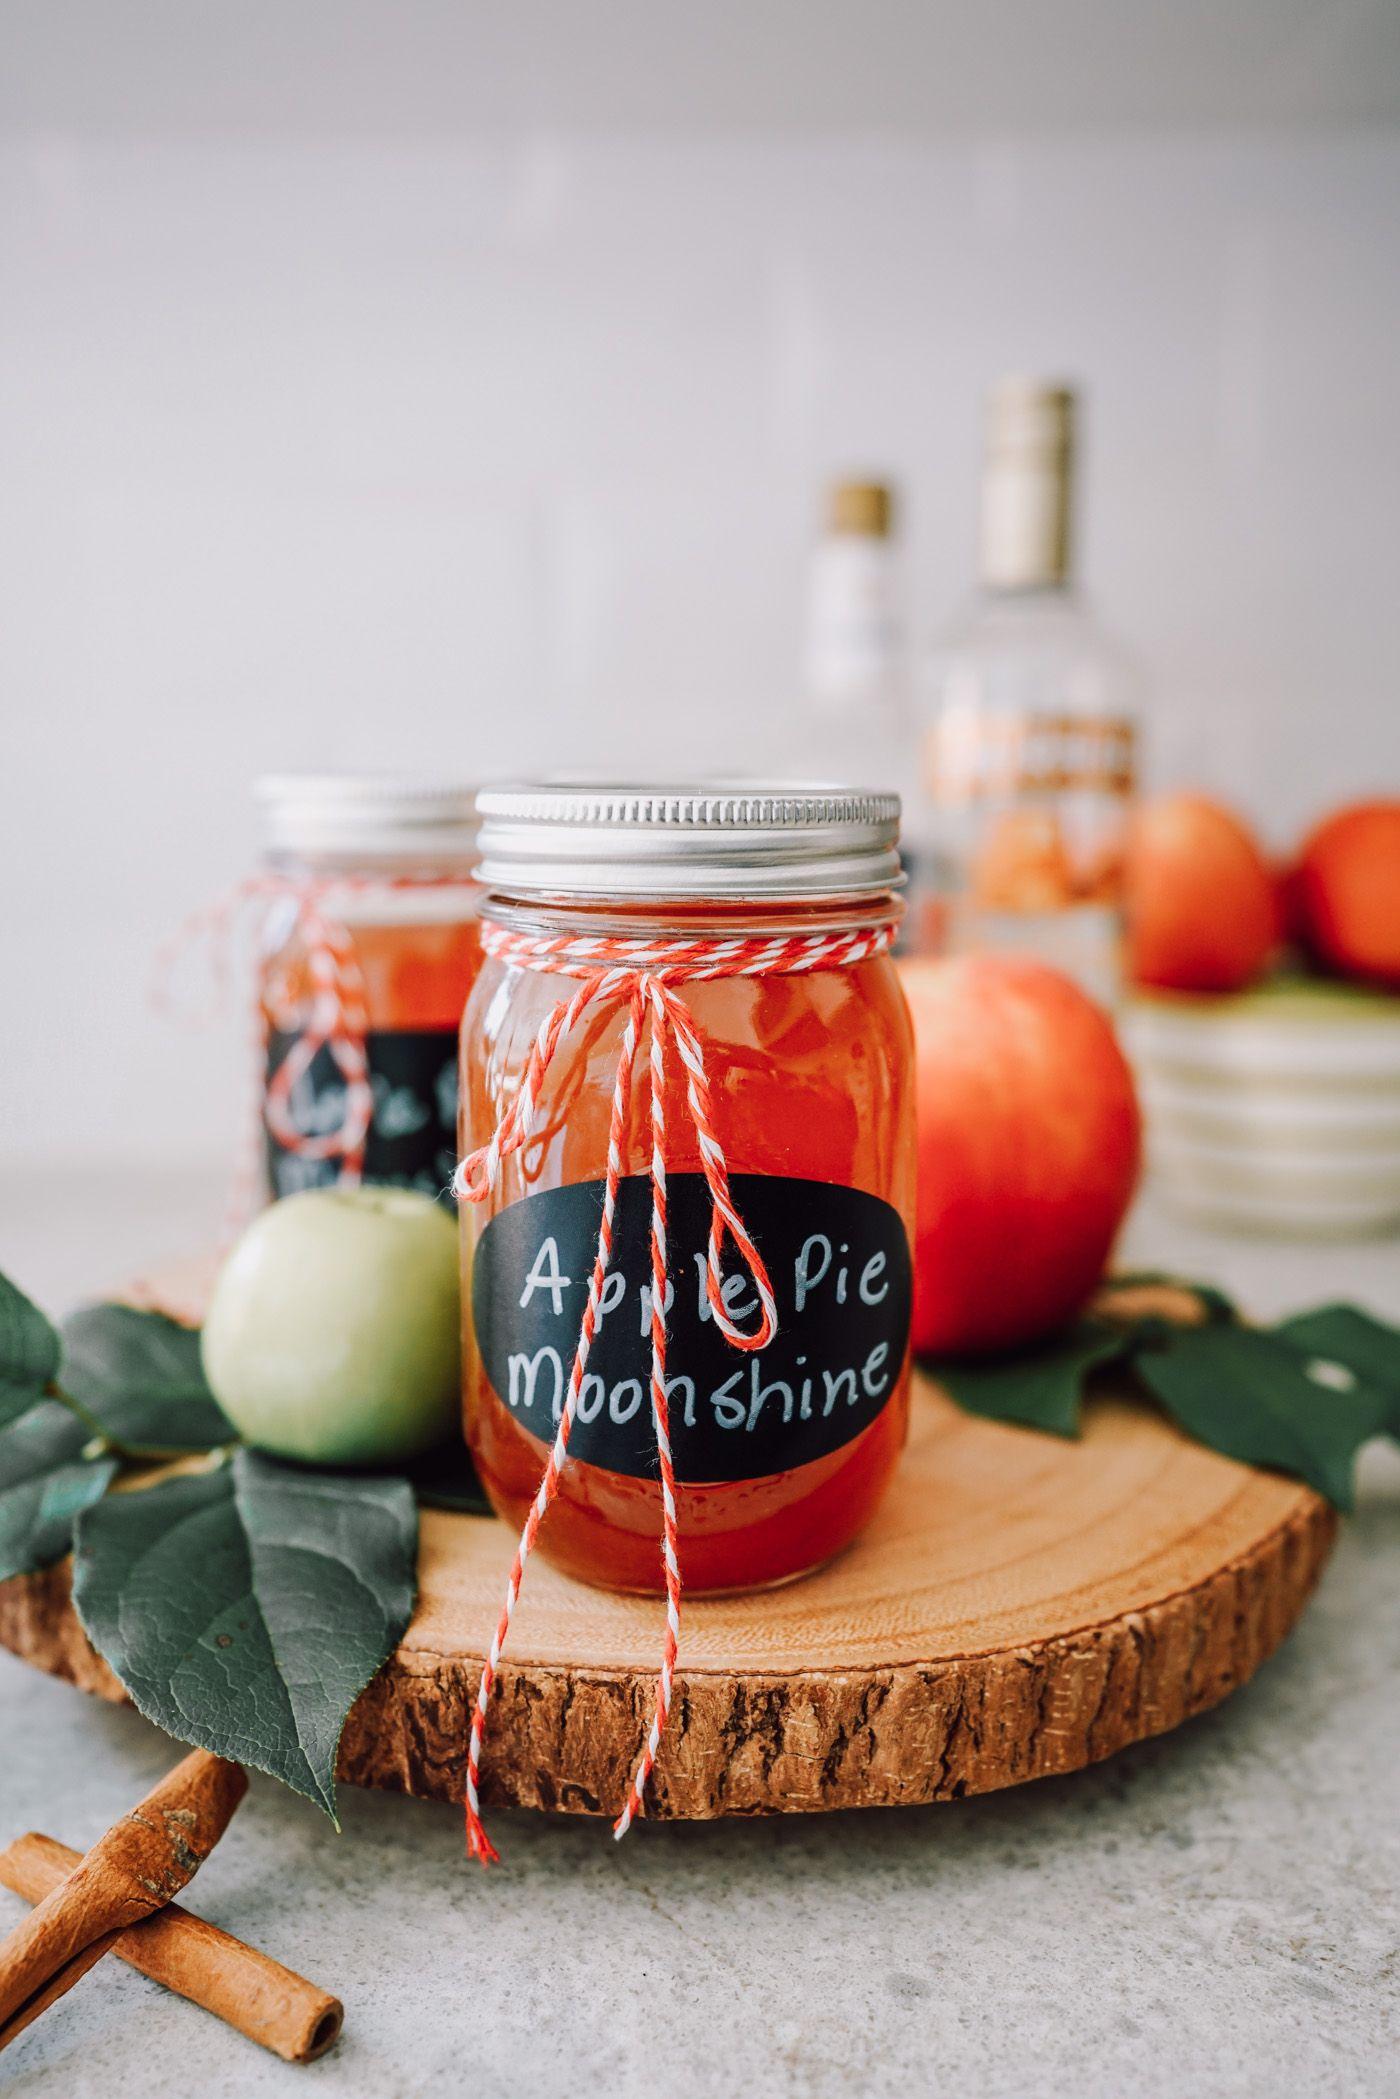 Instant Pot Apple Pie Moonshine Apple pie moonshine